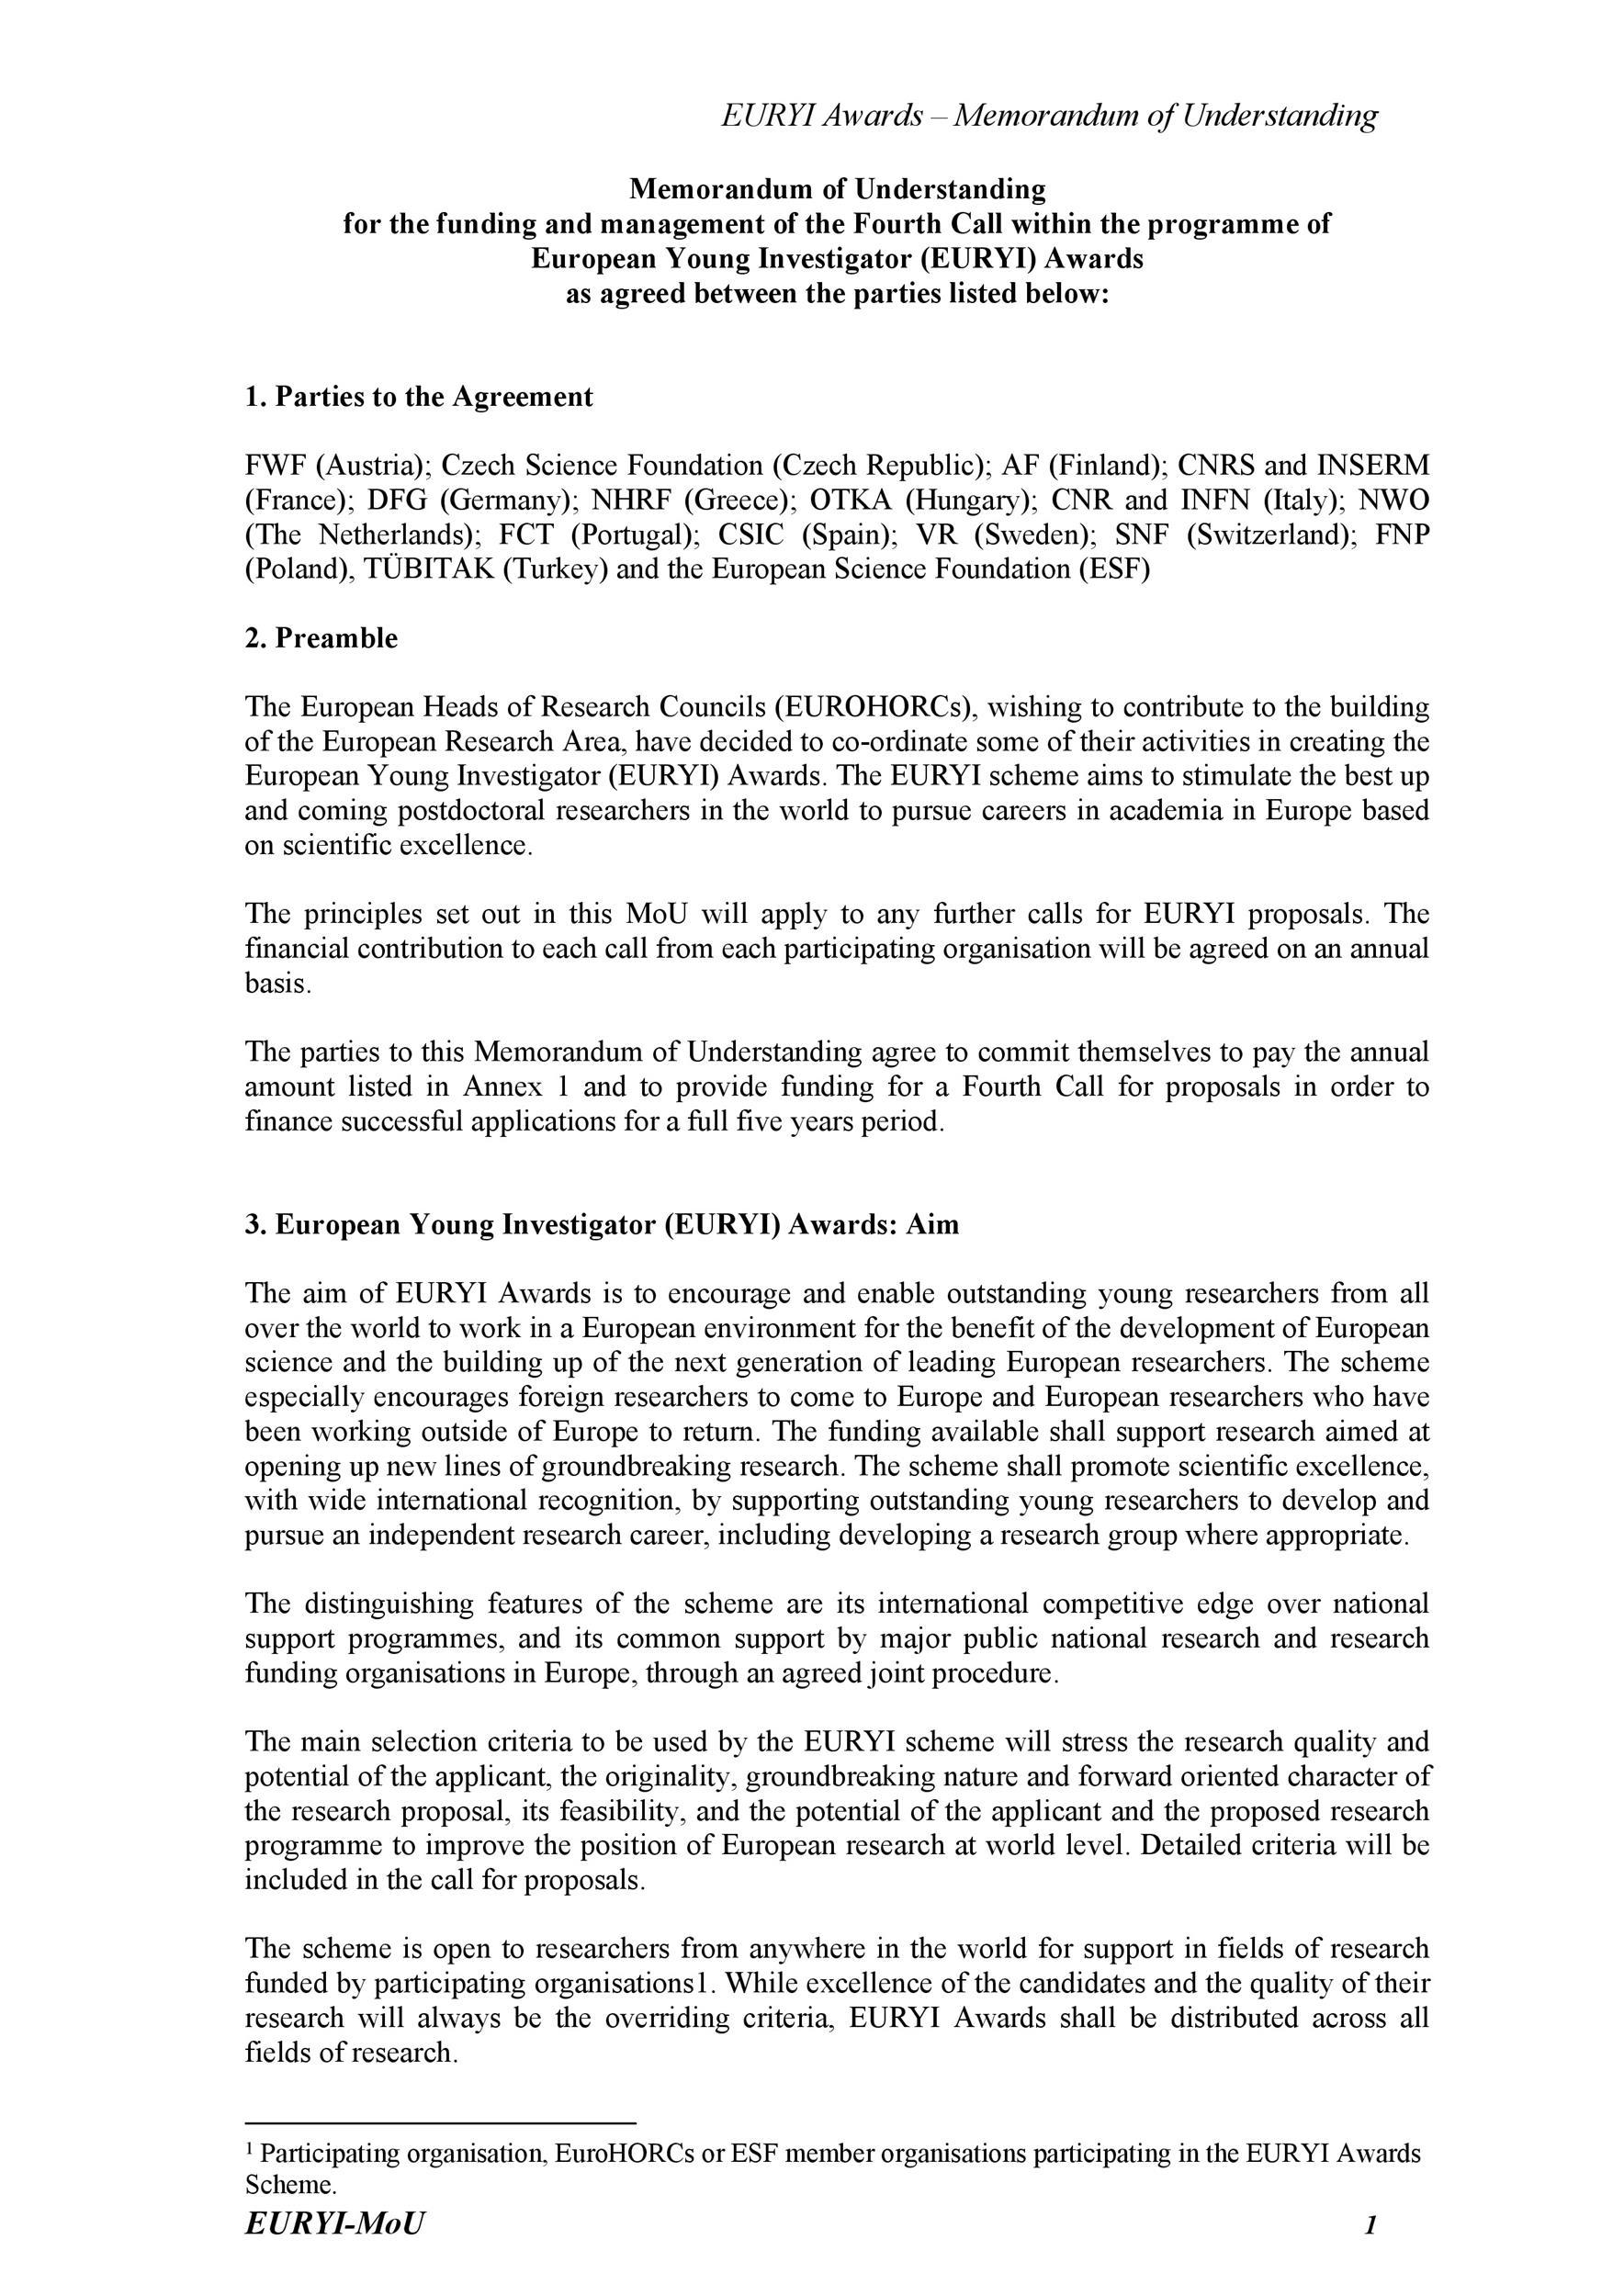 Free Memorandum of Understanding Template 10